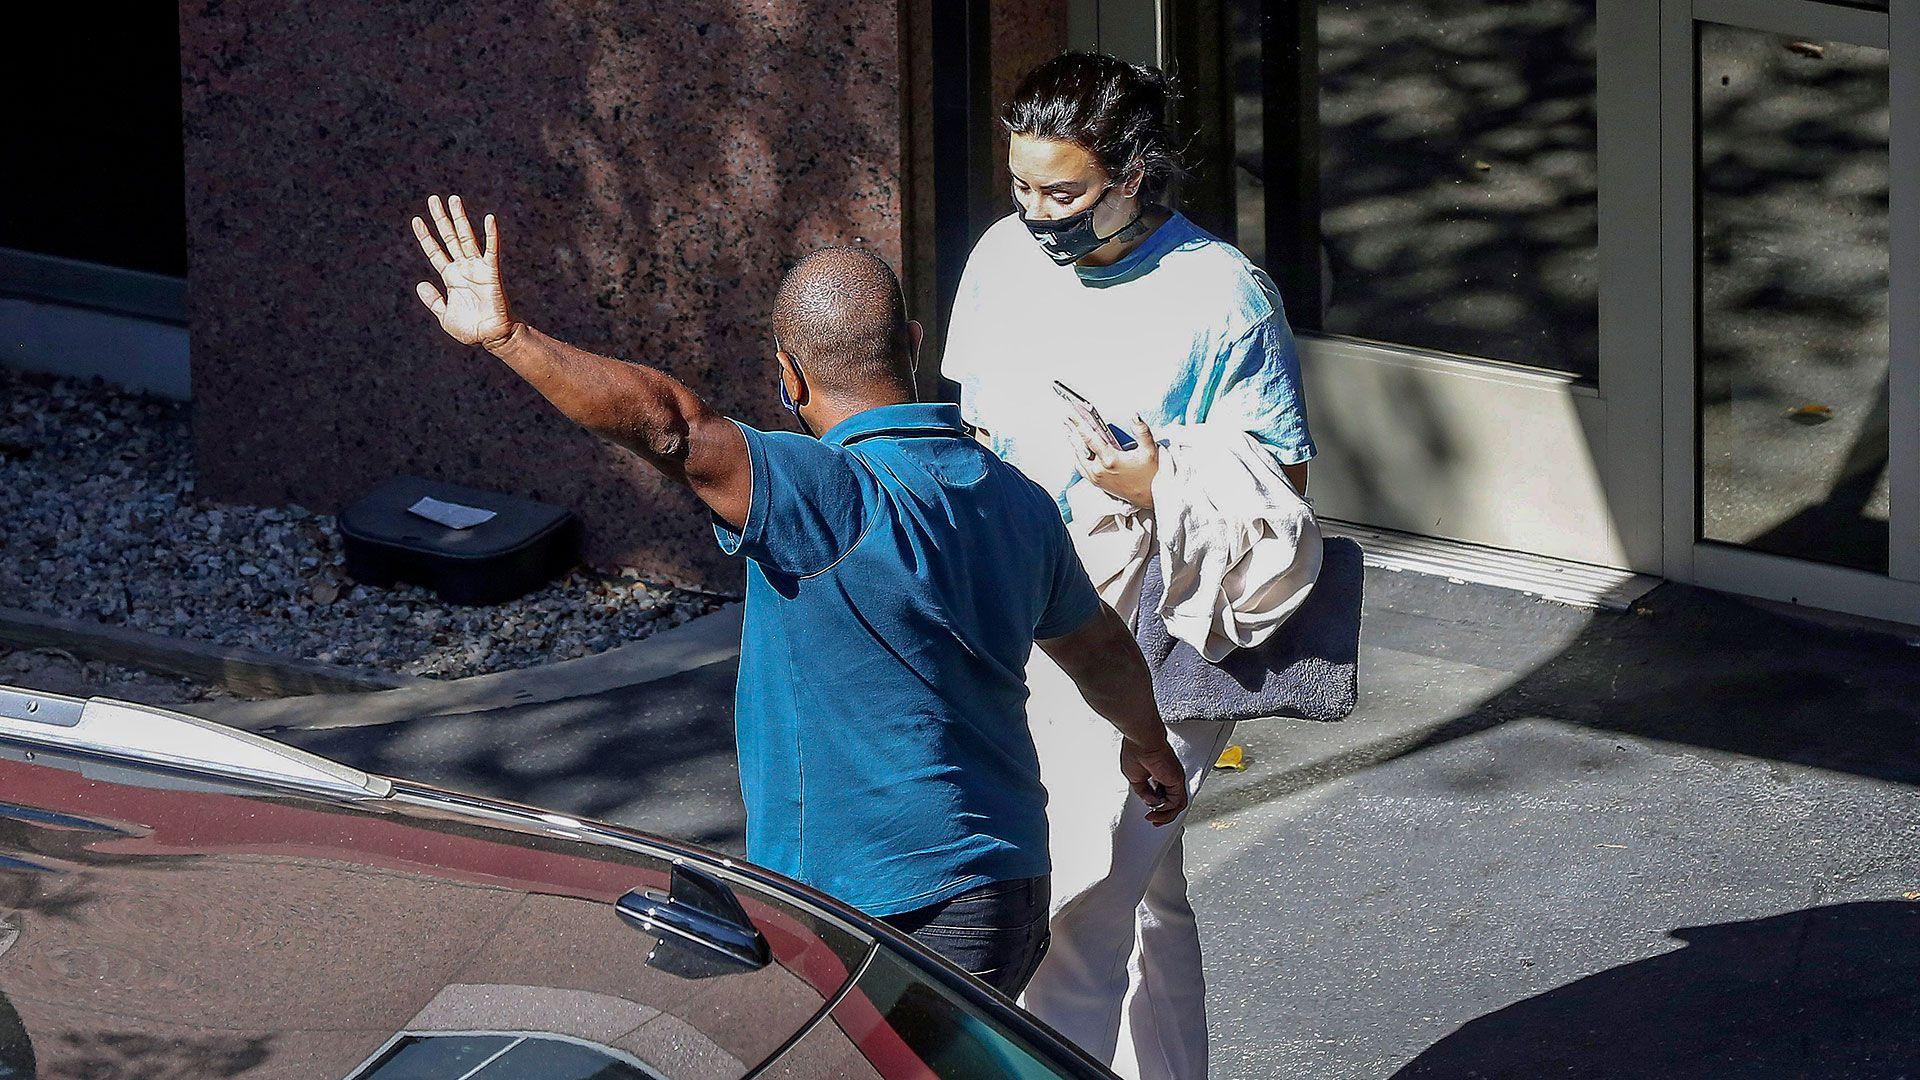 Celebrities-en-un-clic-Demi-Lovato-01102020